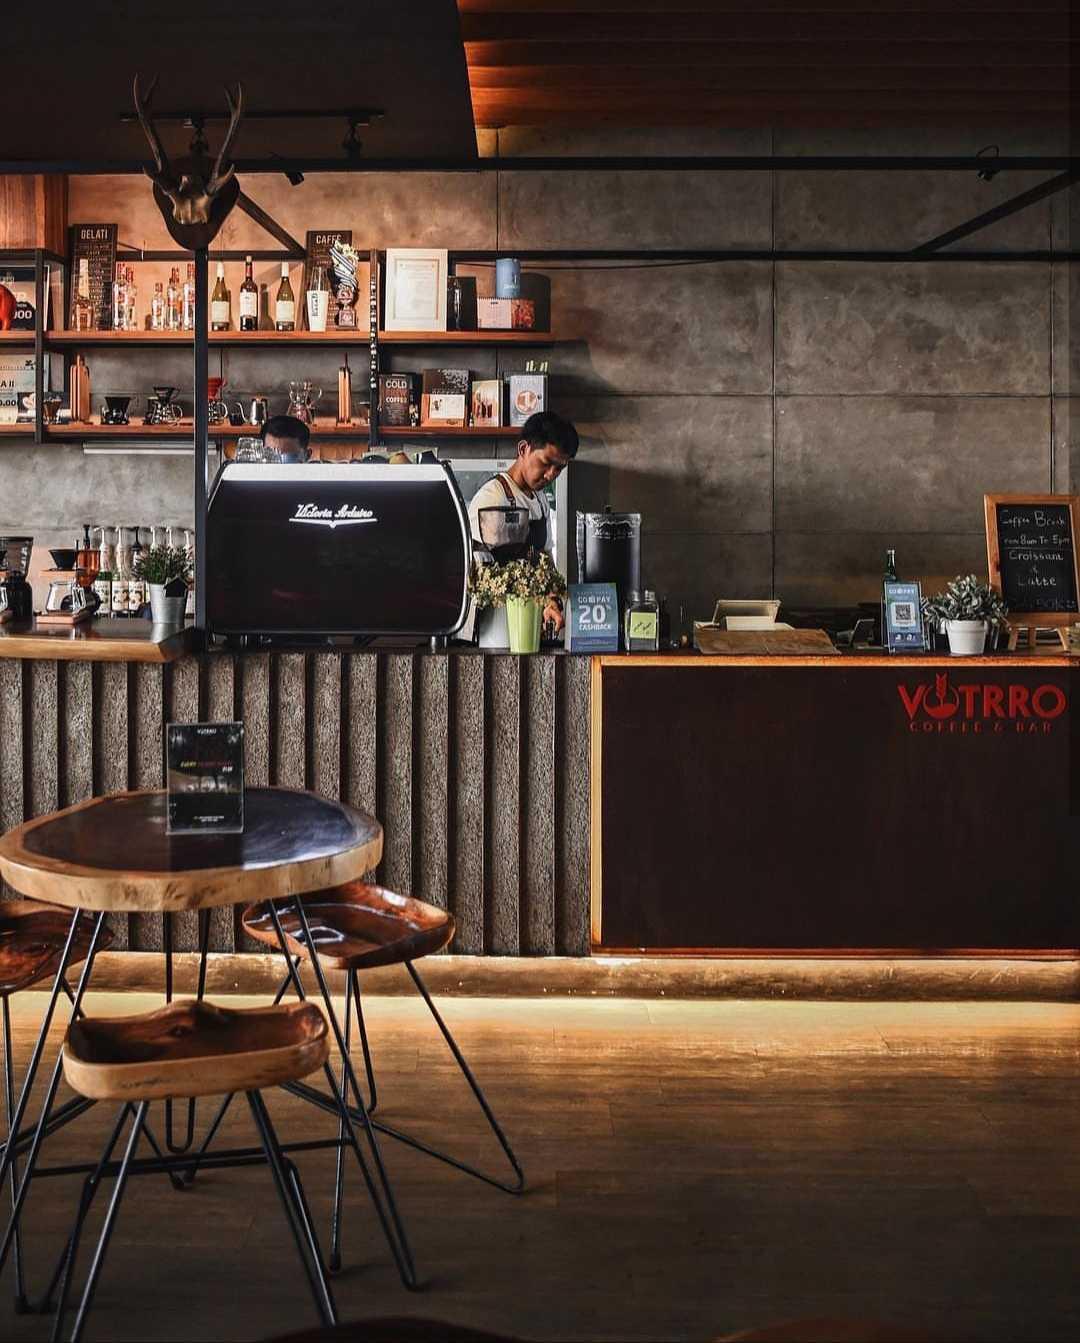 Studiogra/ph Architects Votrro Coffee & Bar Jakarta Utara, Kota Jkt Utara, Daerah Khusus Ibukota Jakarta, Indonesia Jakarta Utara, Kota Jkt Utara, Daerah Khusus Ibukota Jakarta, Indonesia Studio-Graph-Architects-Votrro-Coffee-Bar  <P>Bar Counter</p> 109360